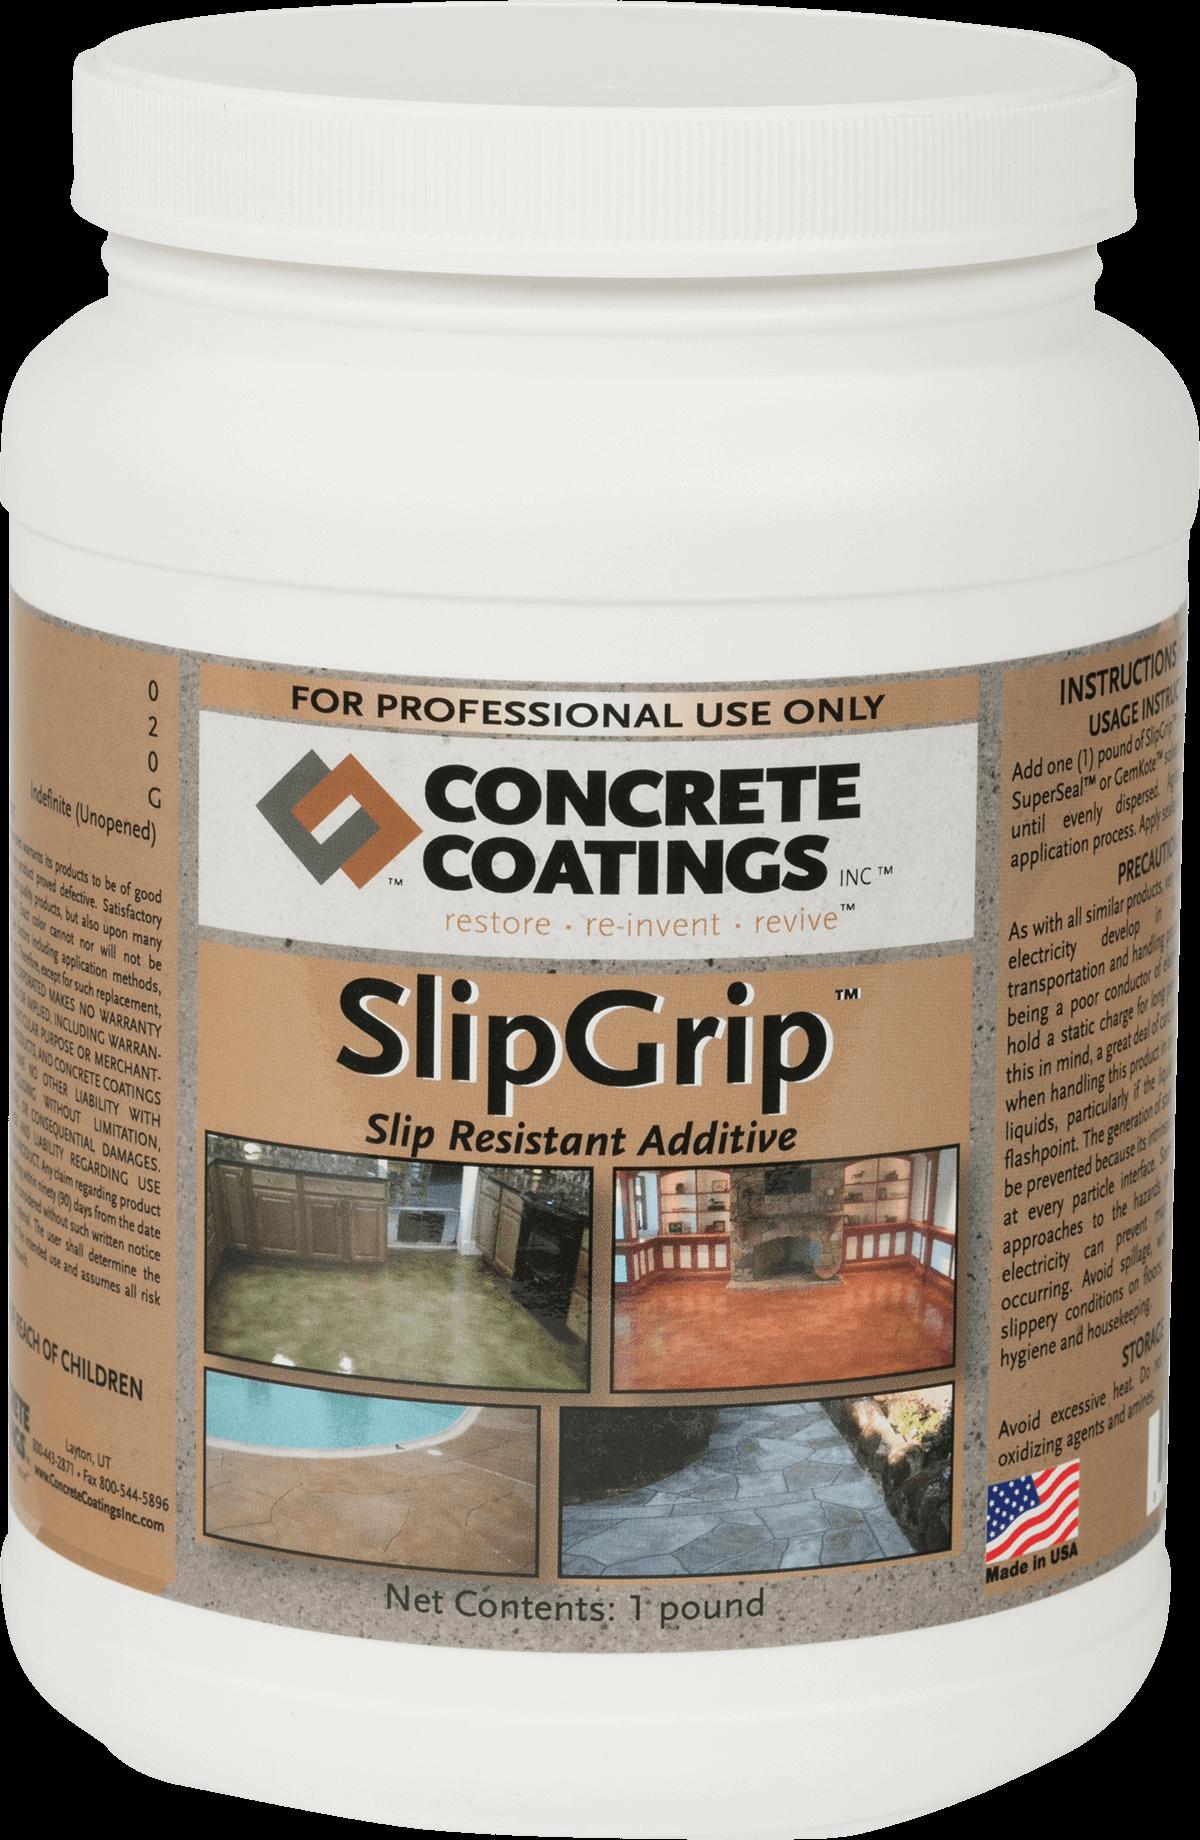 Slip Grip™